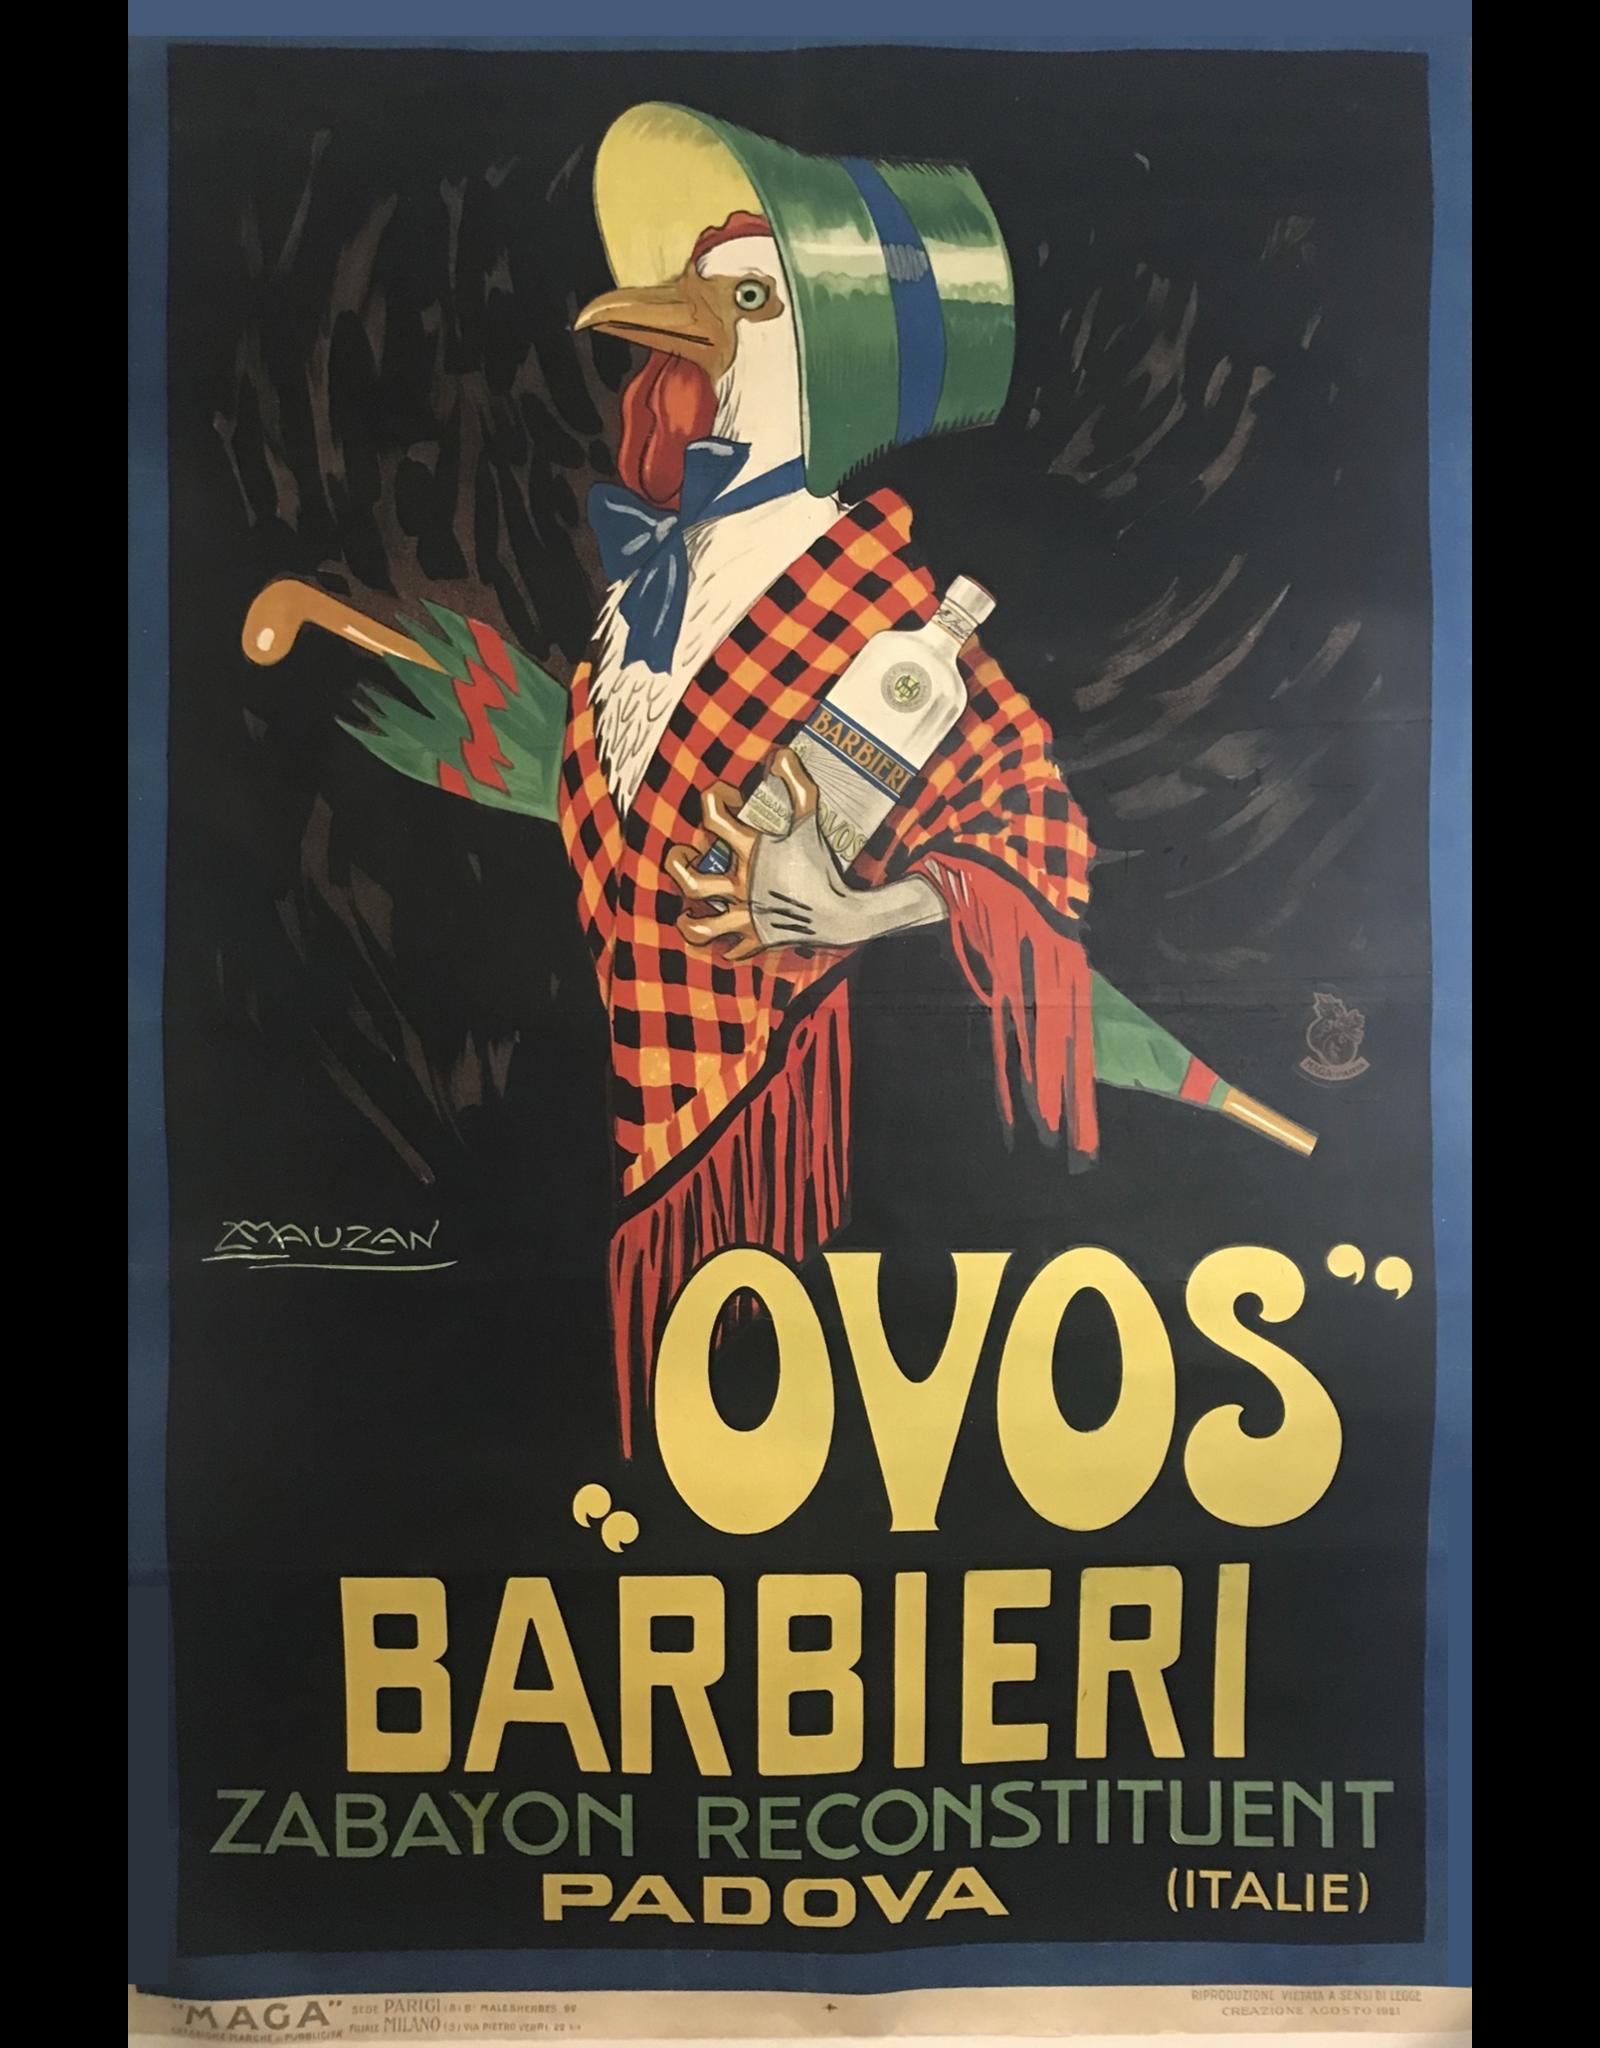 SPV Ovos Barbieri by Mauzan